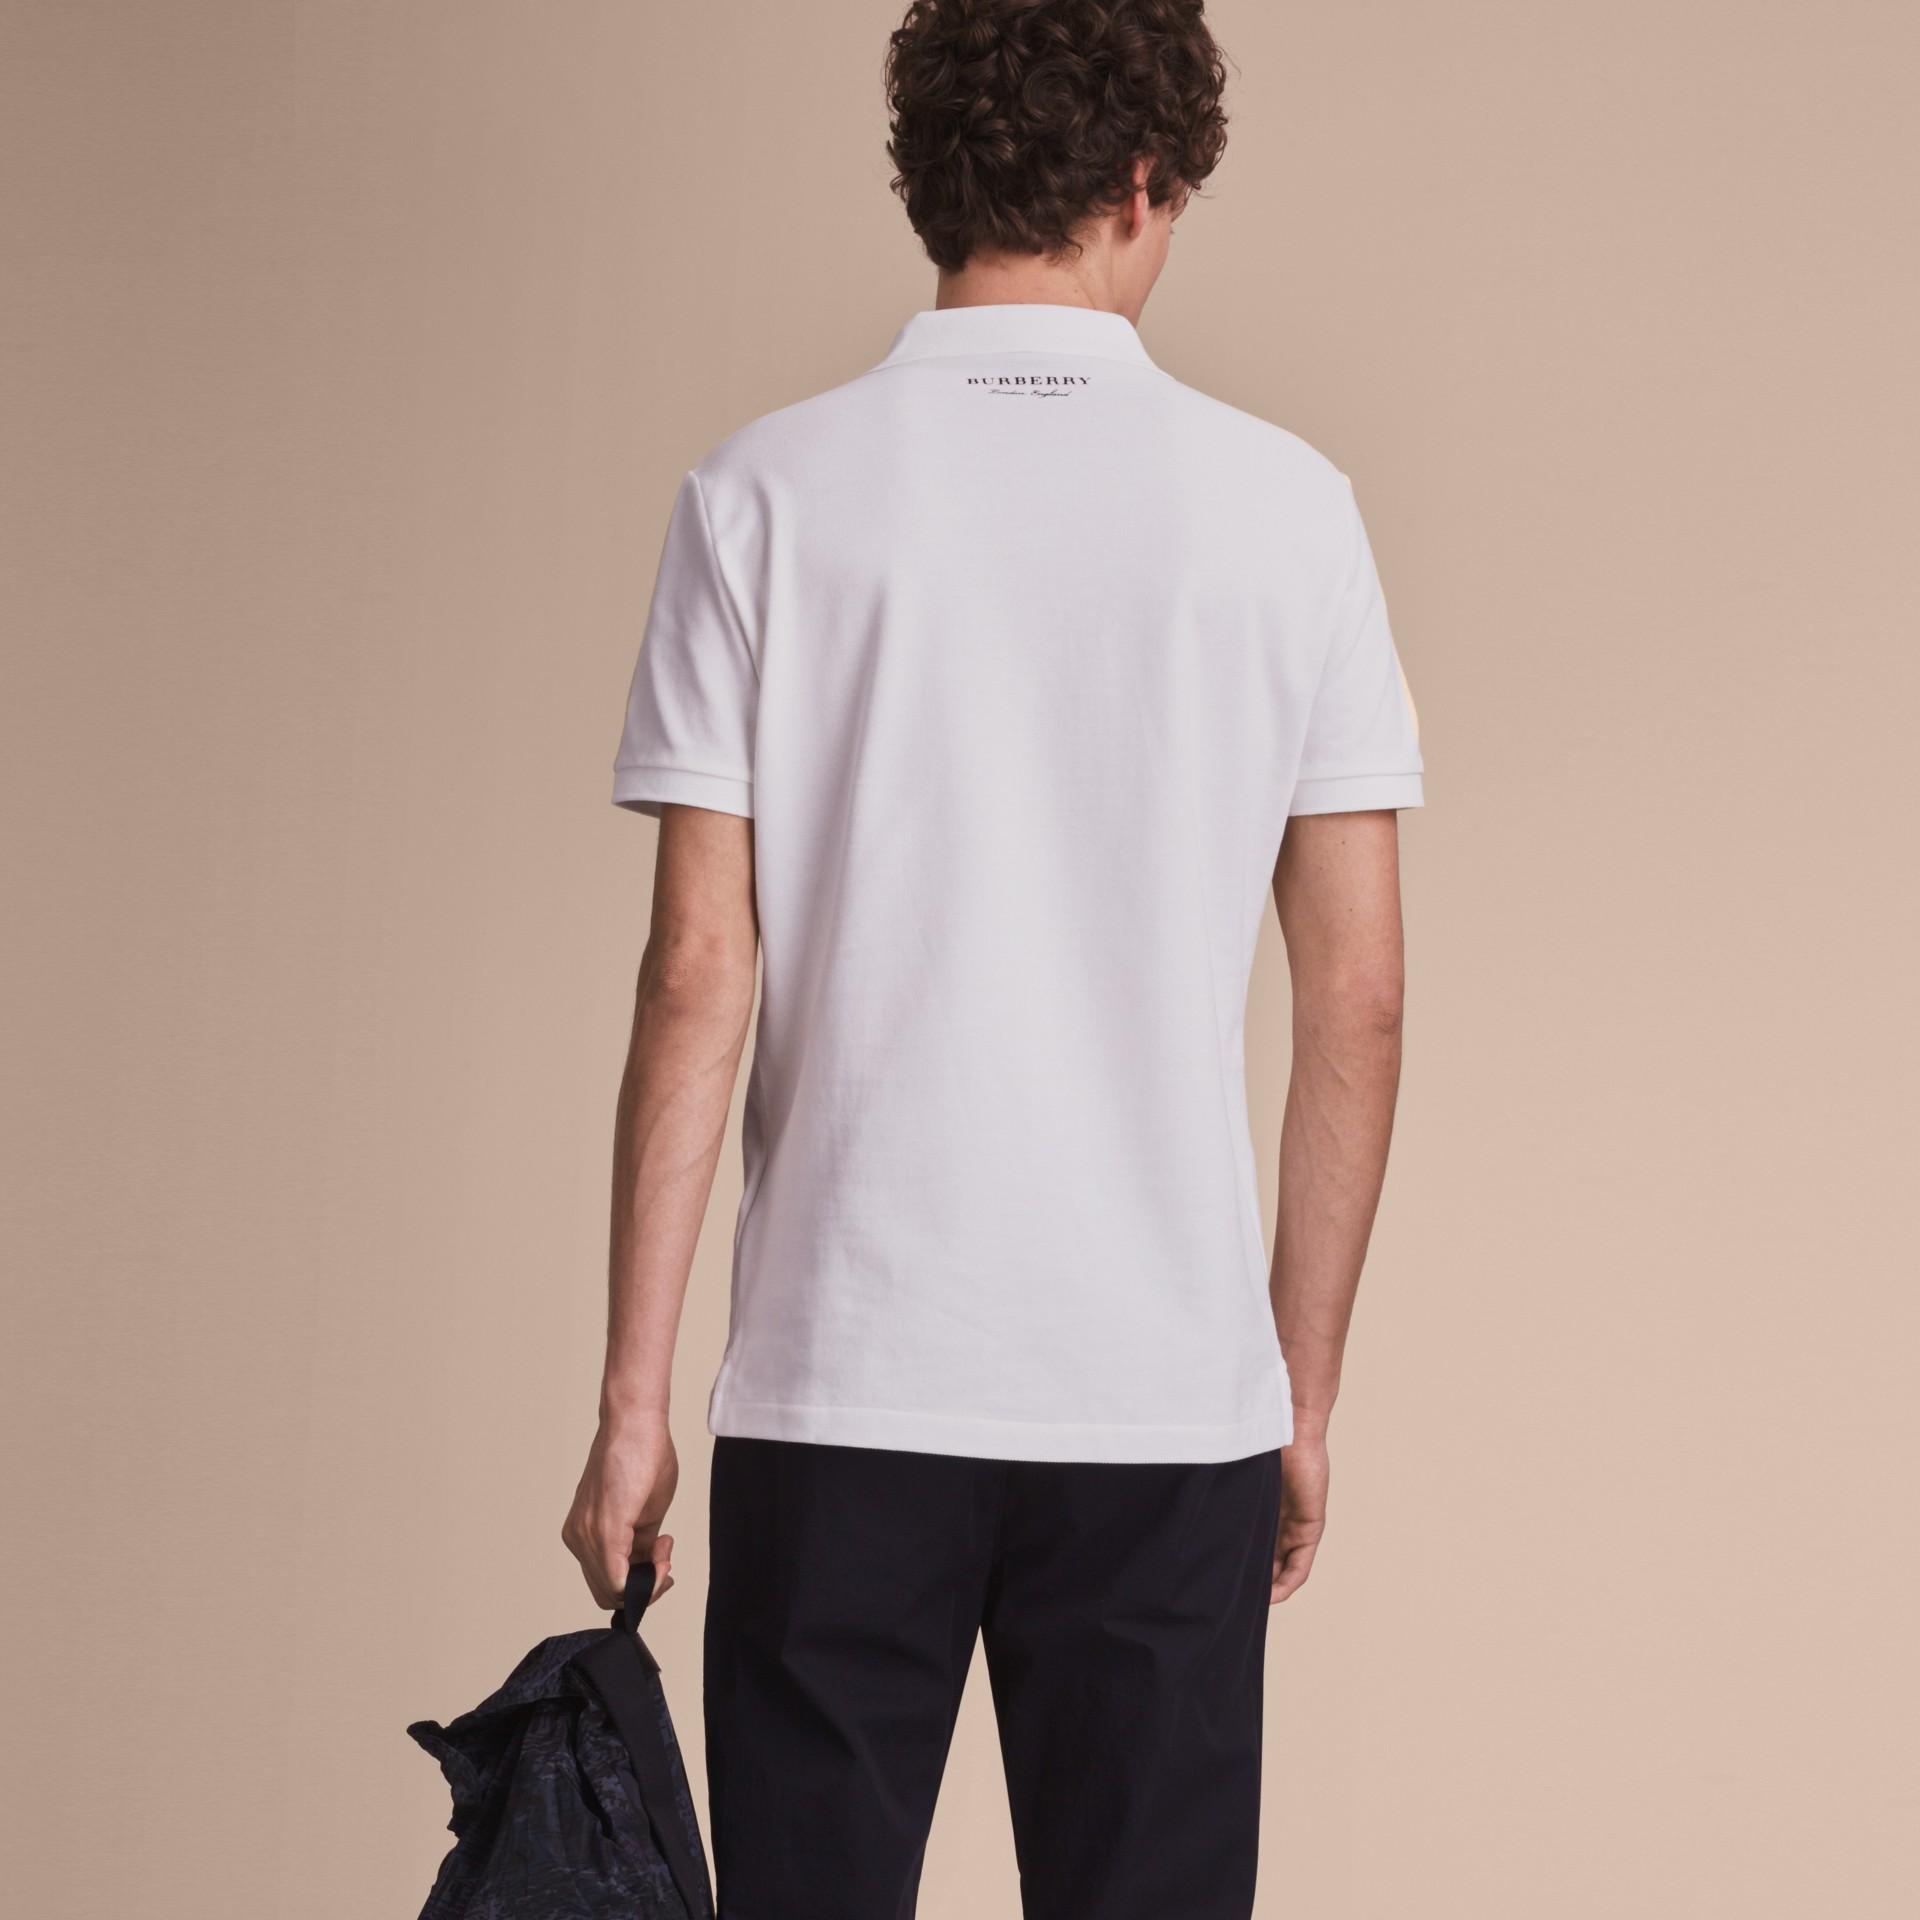 Weather Appliqué Cotton Piqué Polo Shirt White - gallery image 3